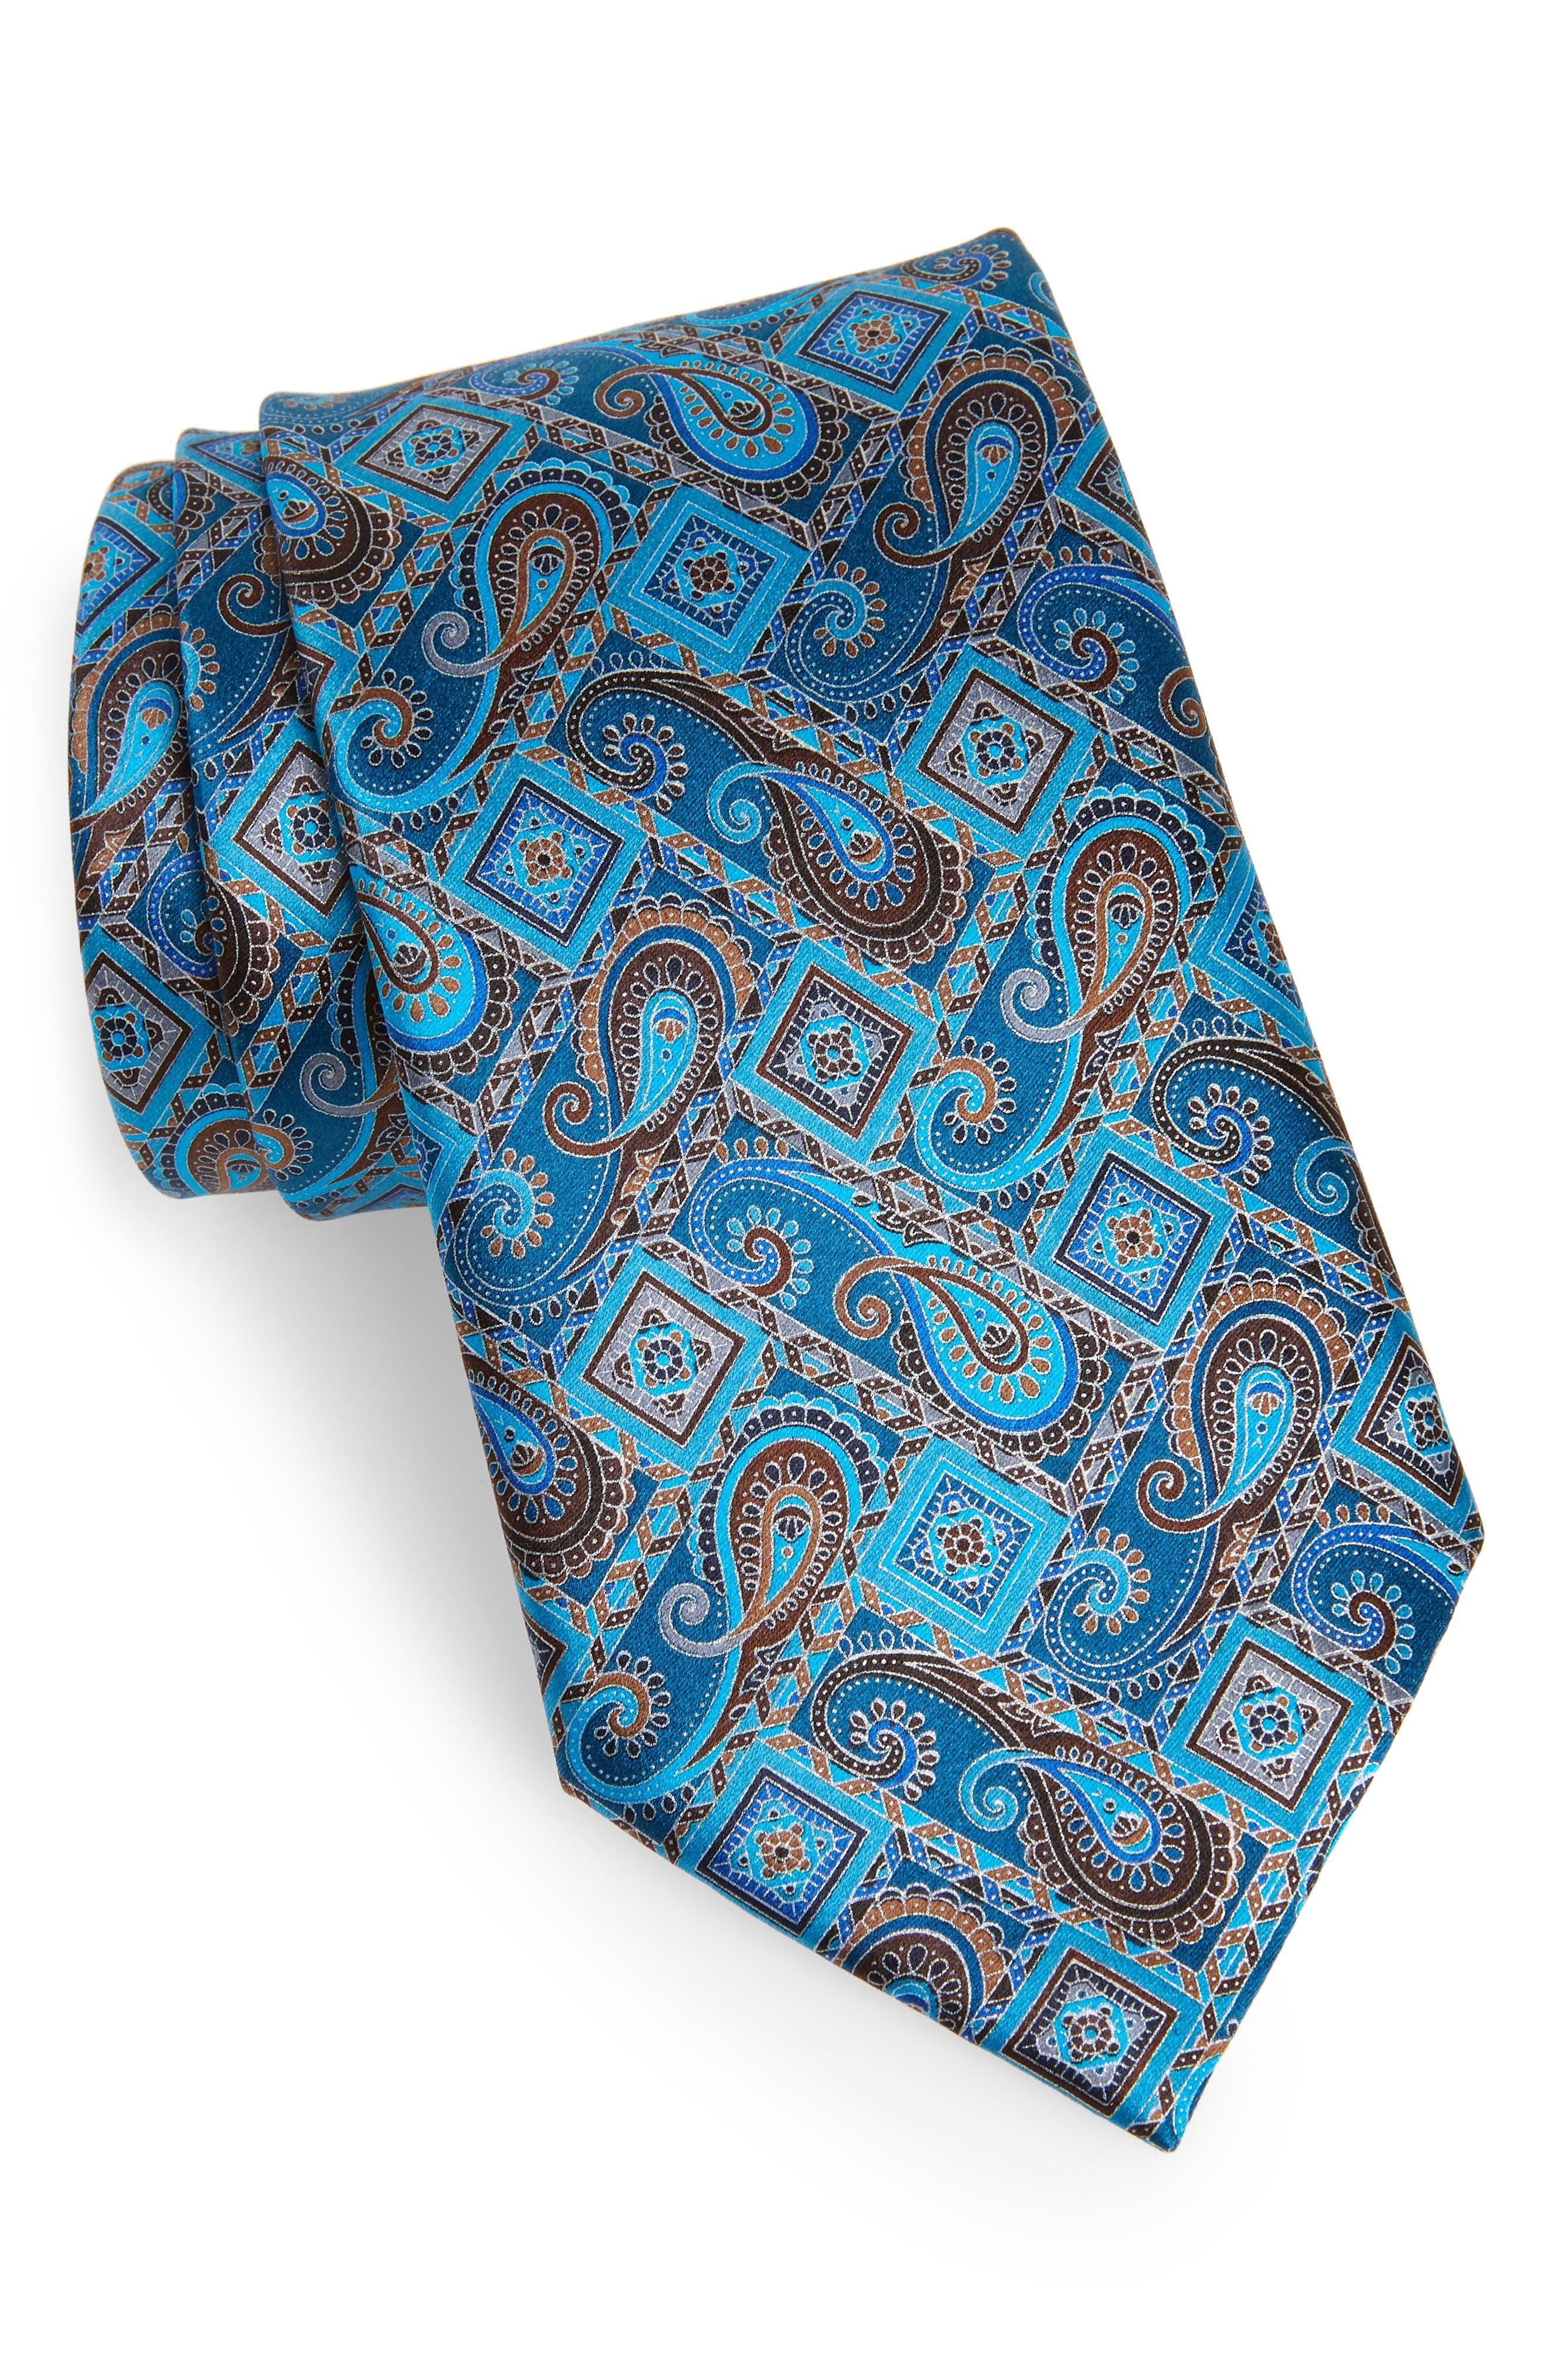 ERMENEGILDO ZEGNA Quindici + Quindici Paisley Silk Tie, Main, color, BLUE